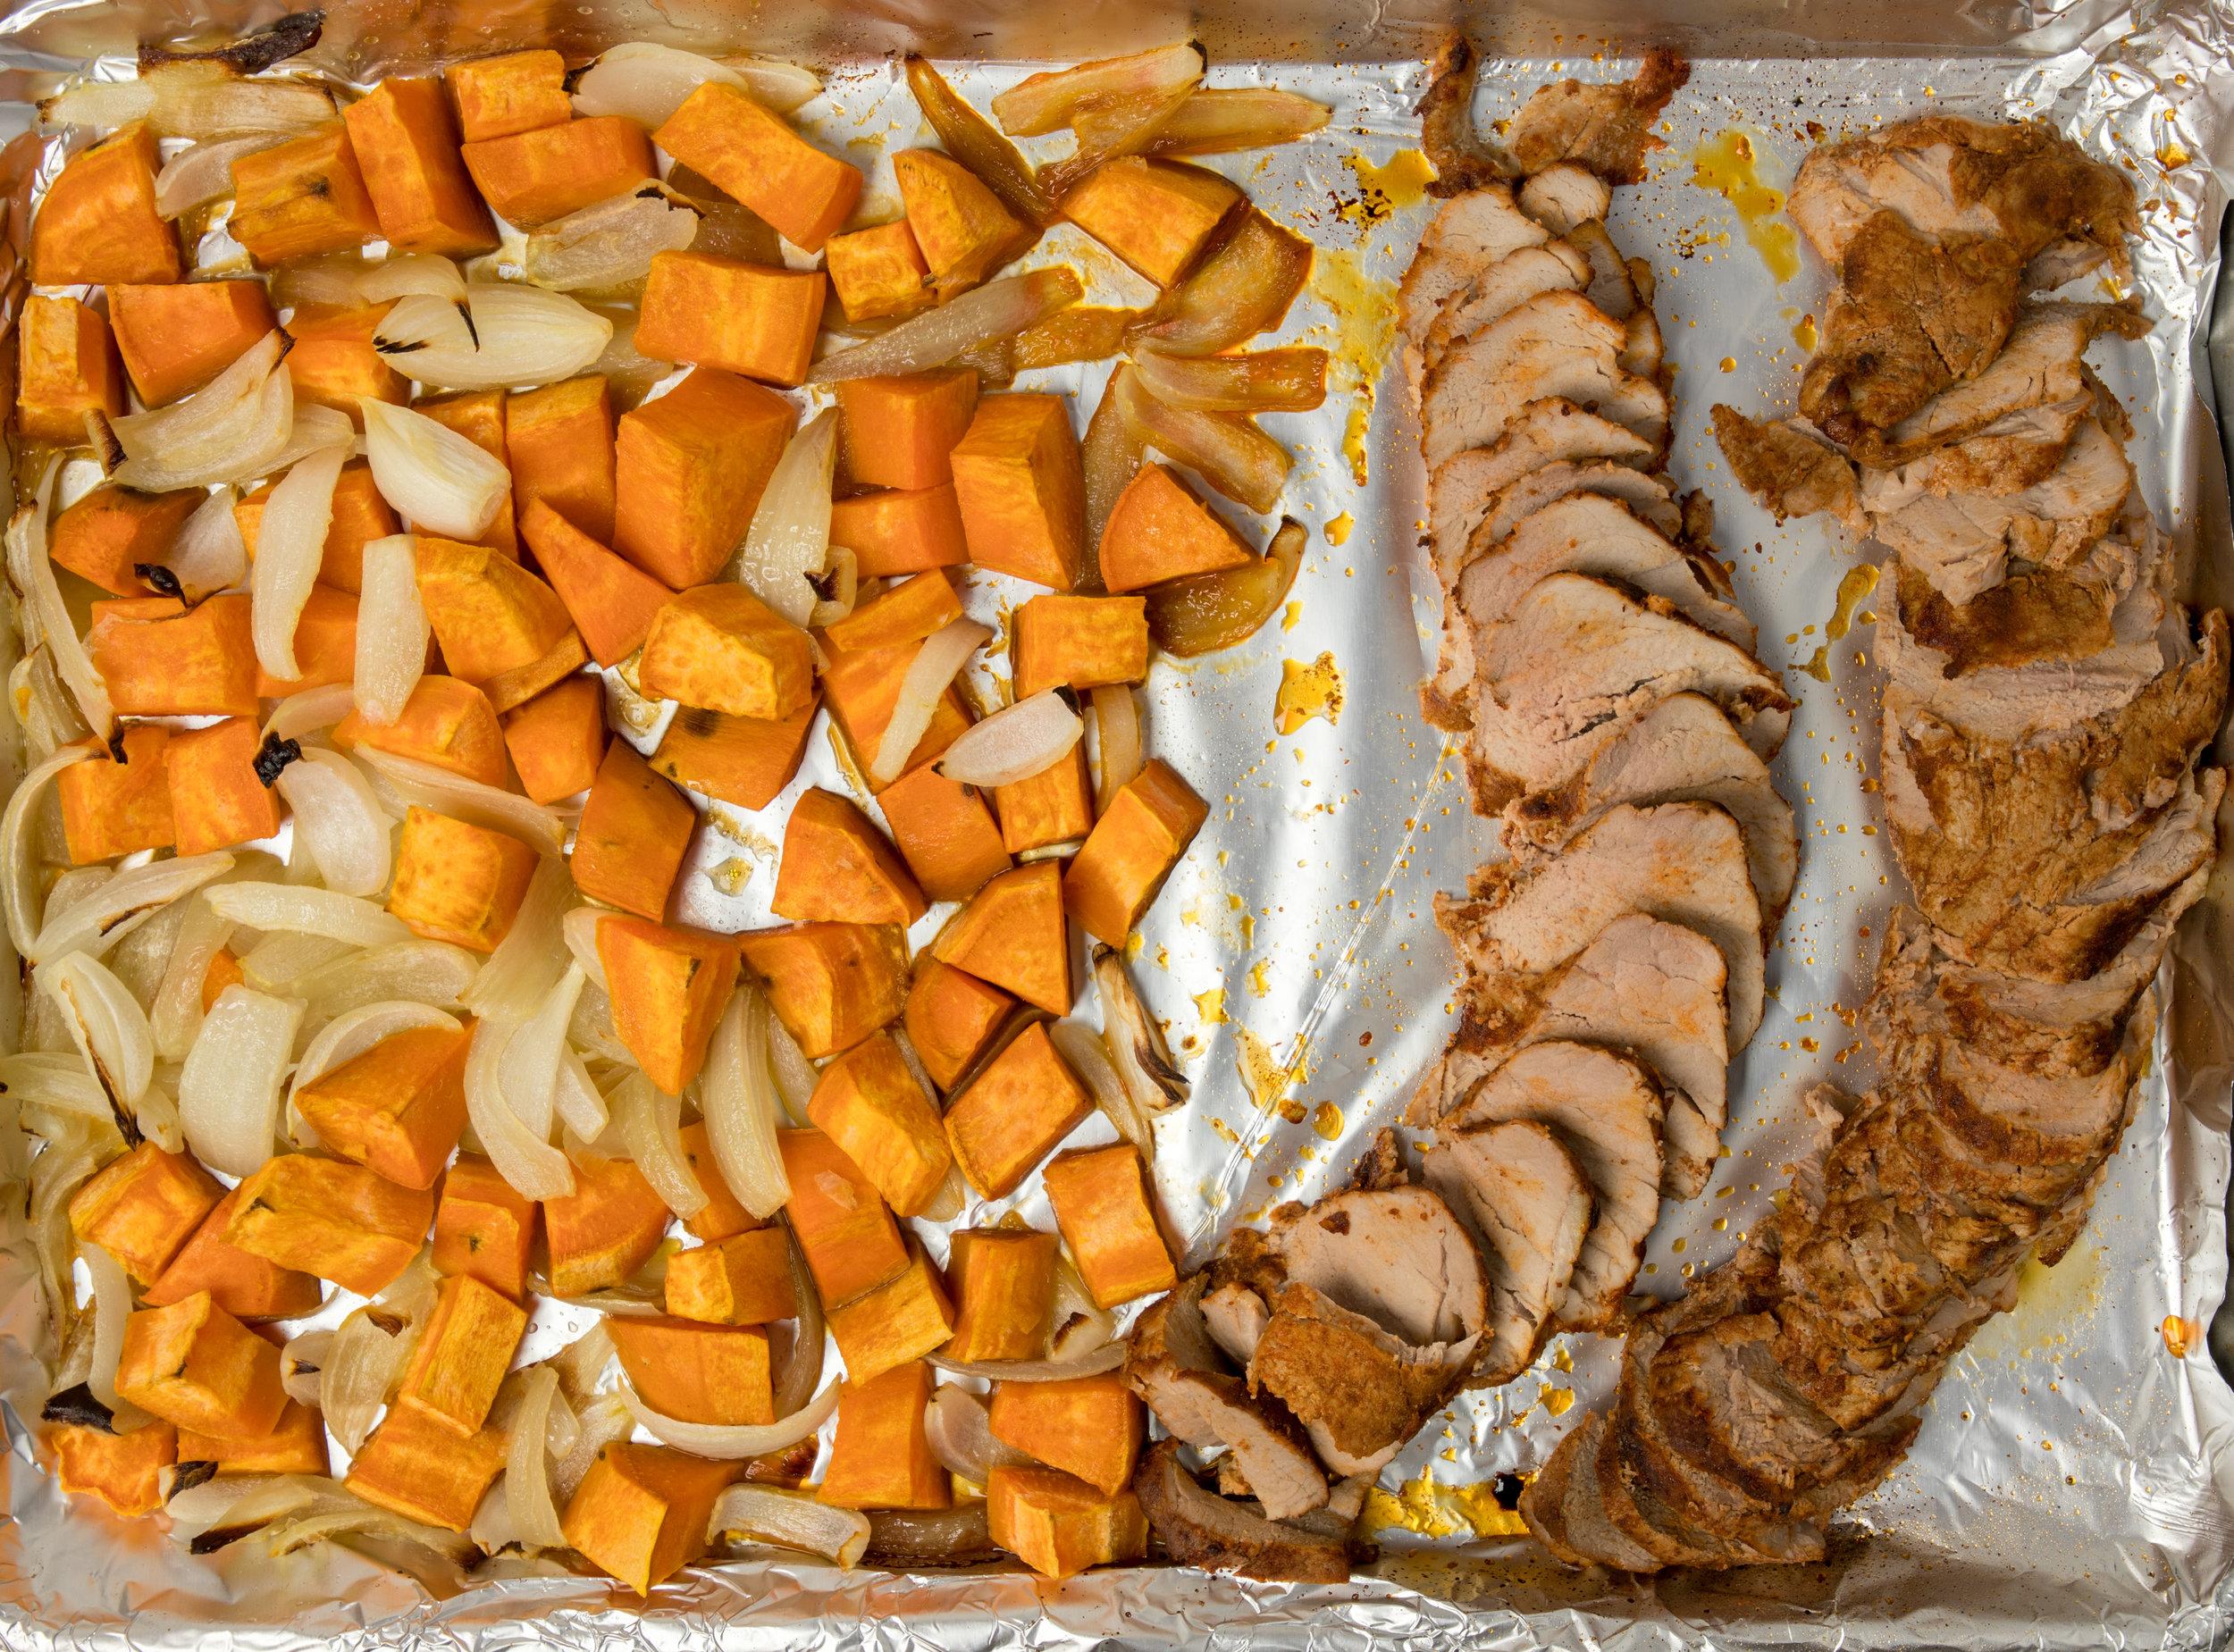 sheet-pan-pork-tenderloin-thyme-aioli-and-sweet-potatoes.jpg